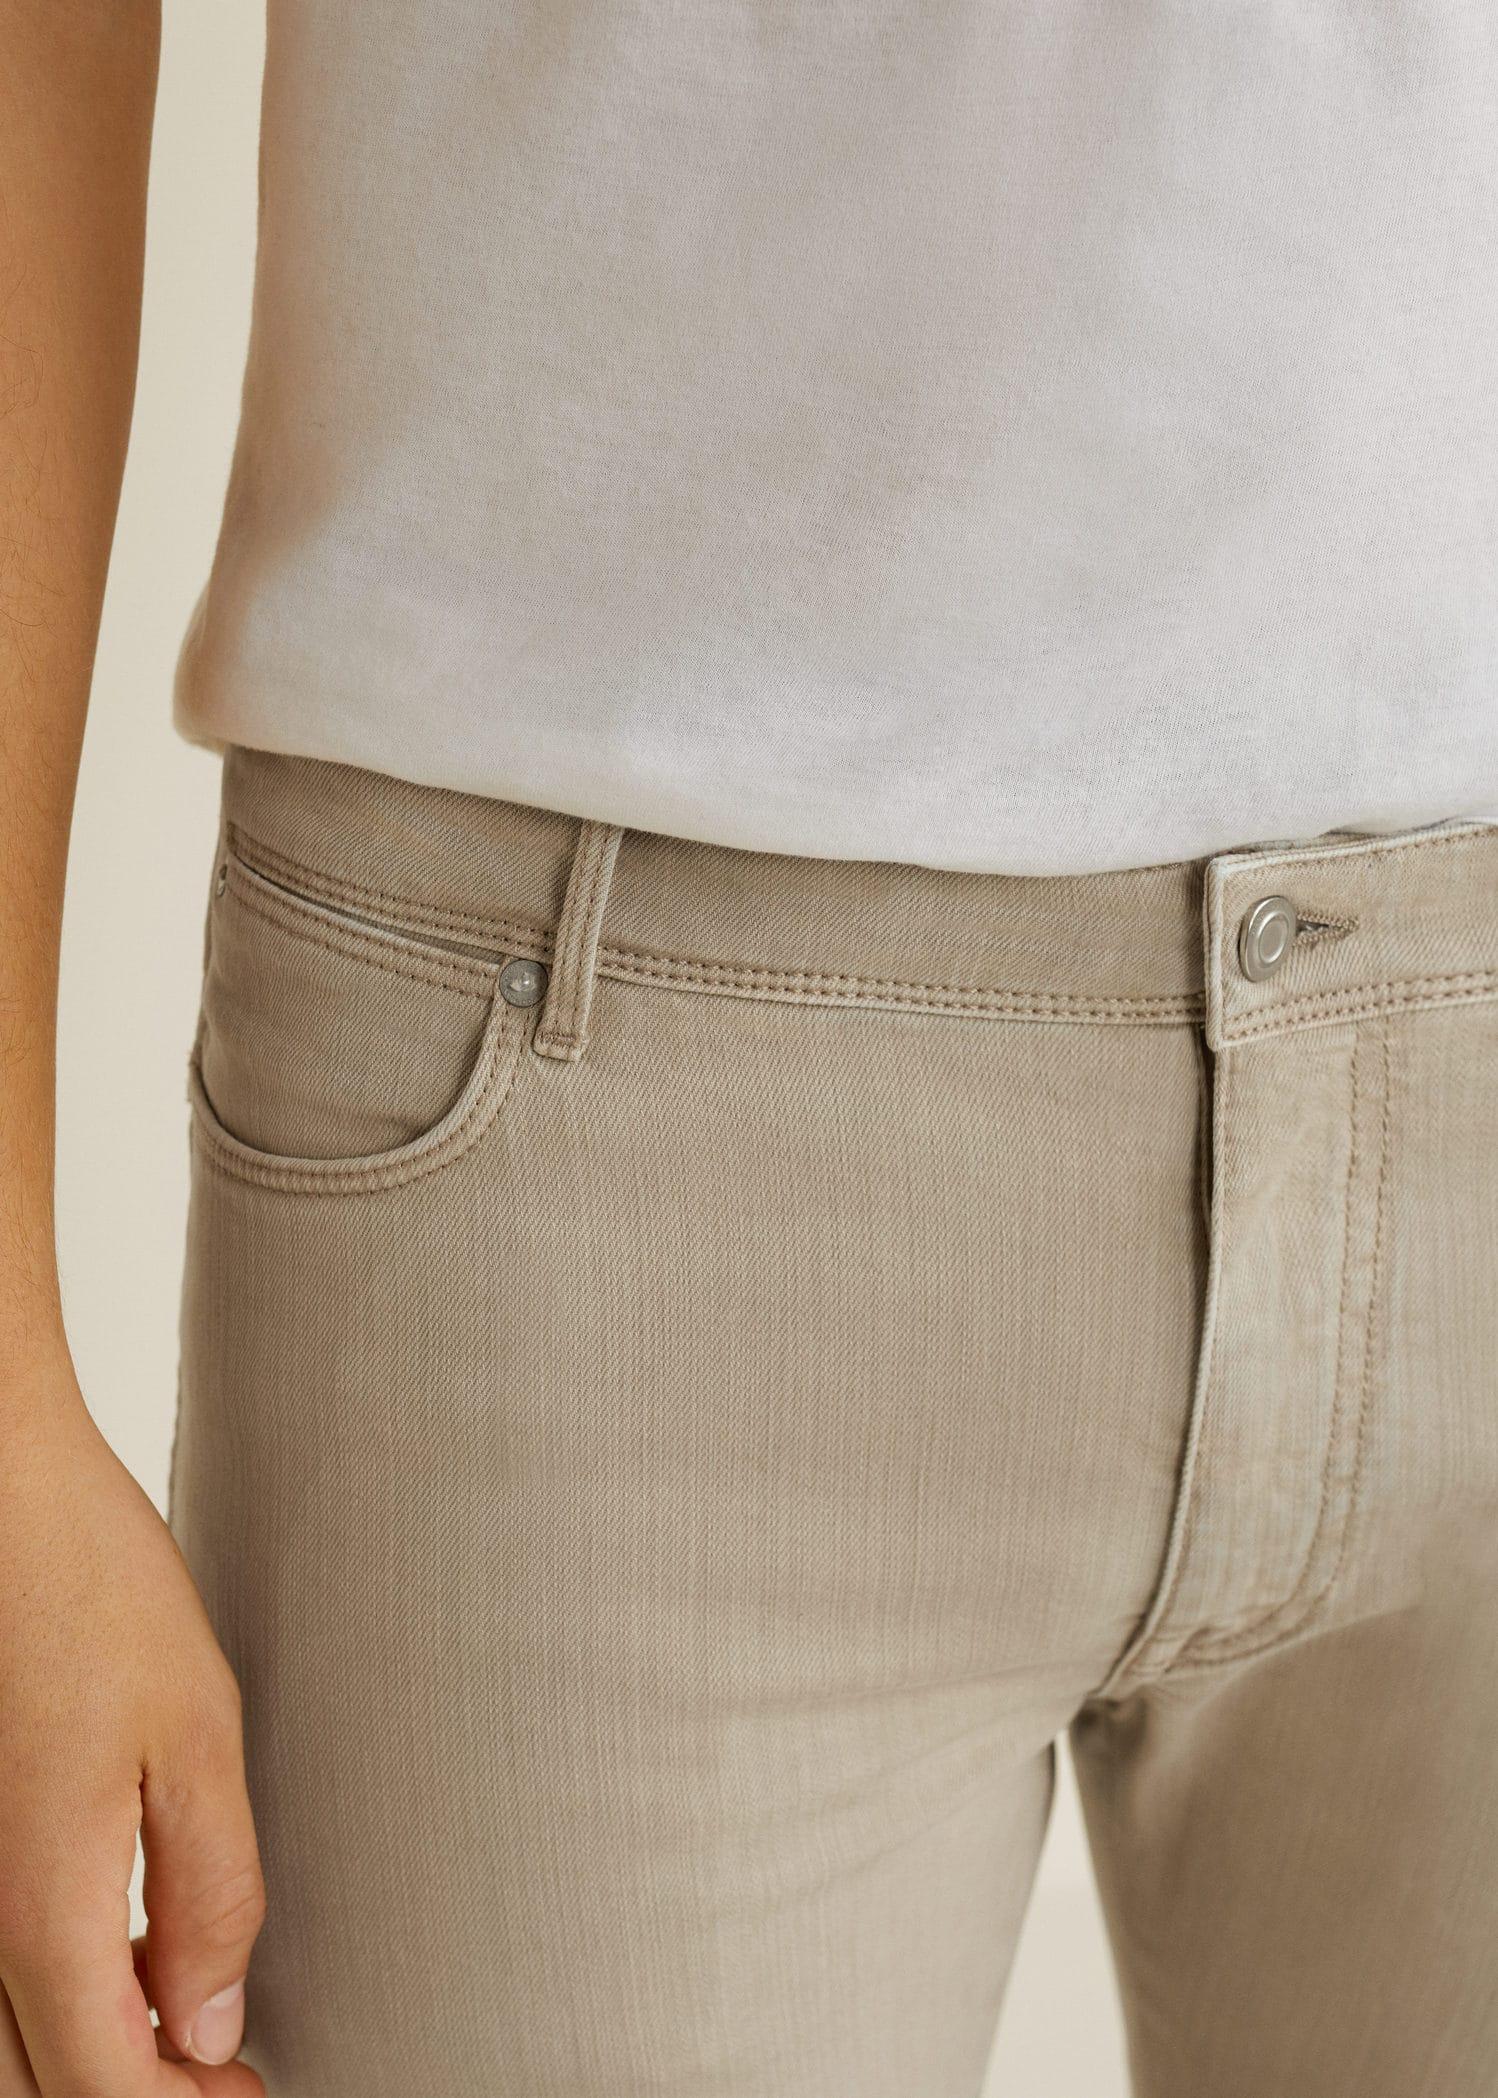 Jeans Slim Man Mango Fit España Hombre Beige Patrick rv5Ynqr